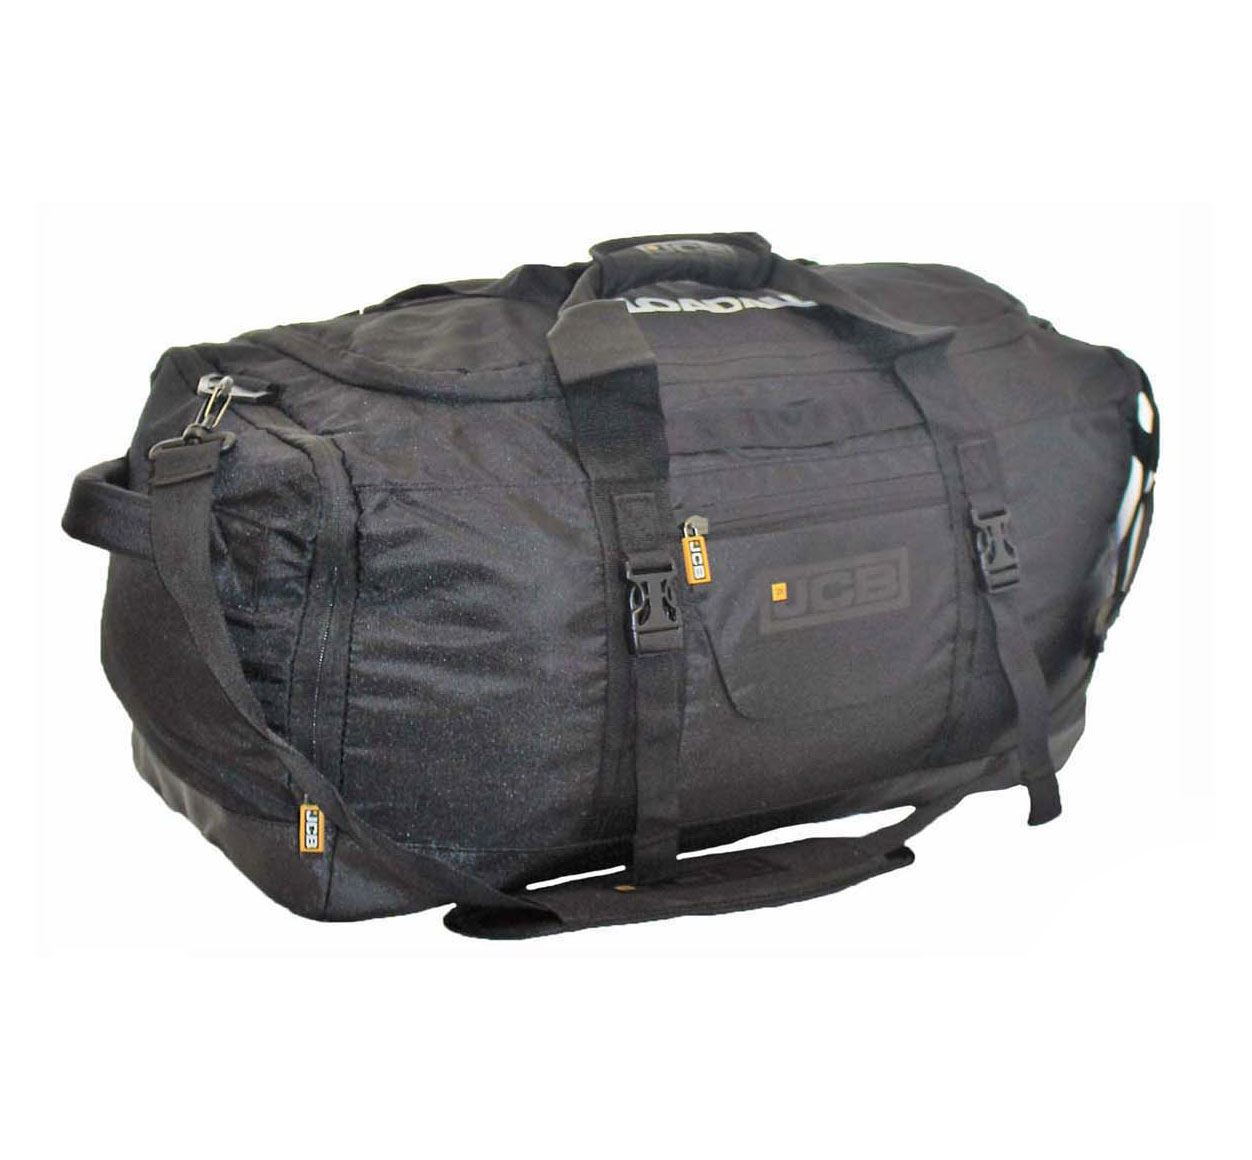 Mens-Ladies-Unisex-JCB-Holdall-Sports-Duffle-Bag-49-5L-Travel-Flight-Cabin